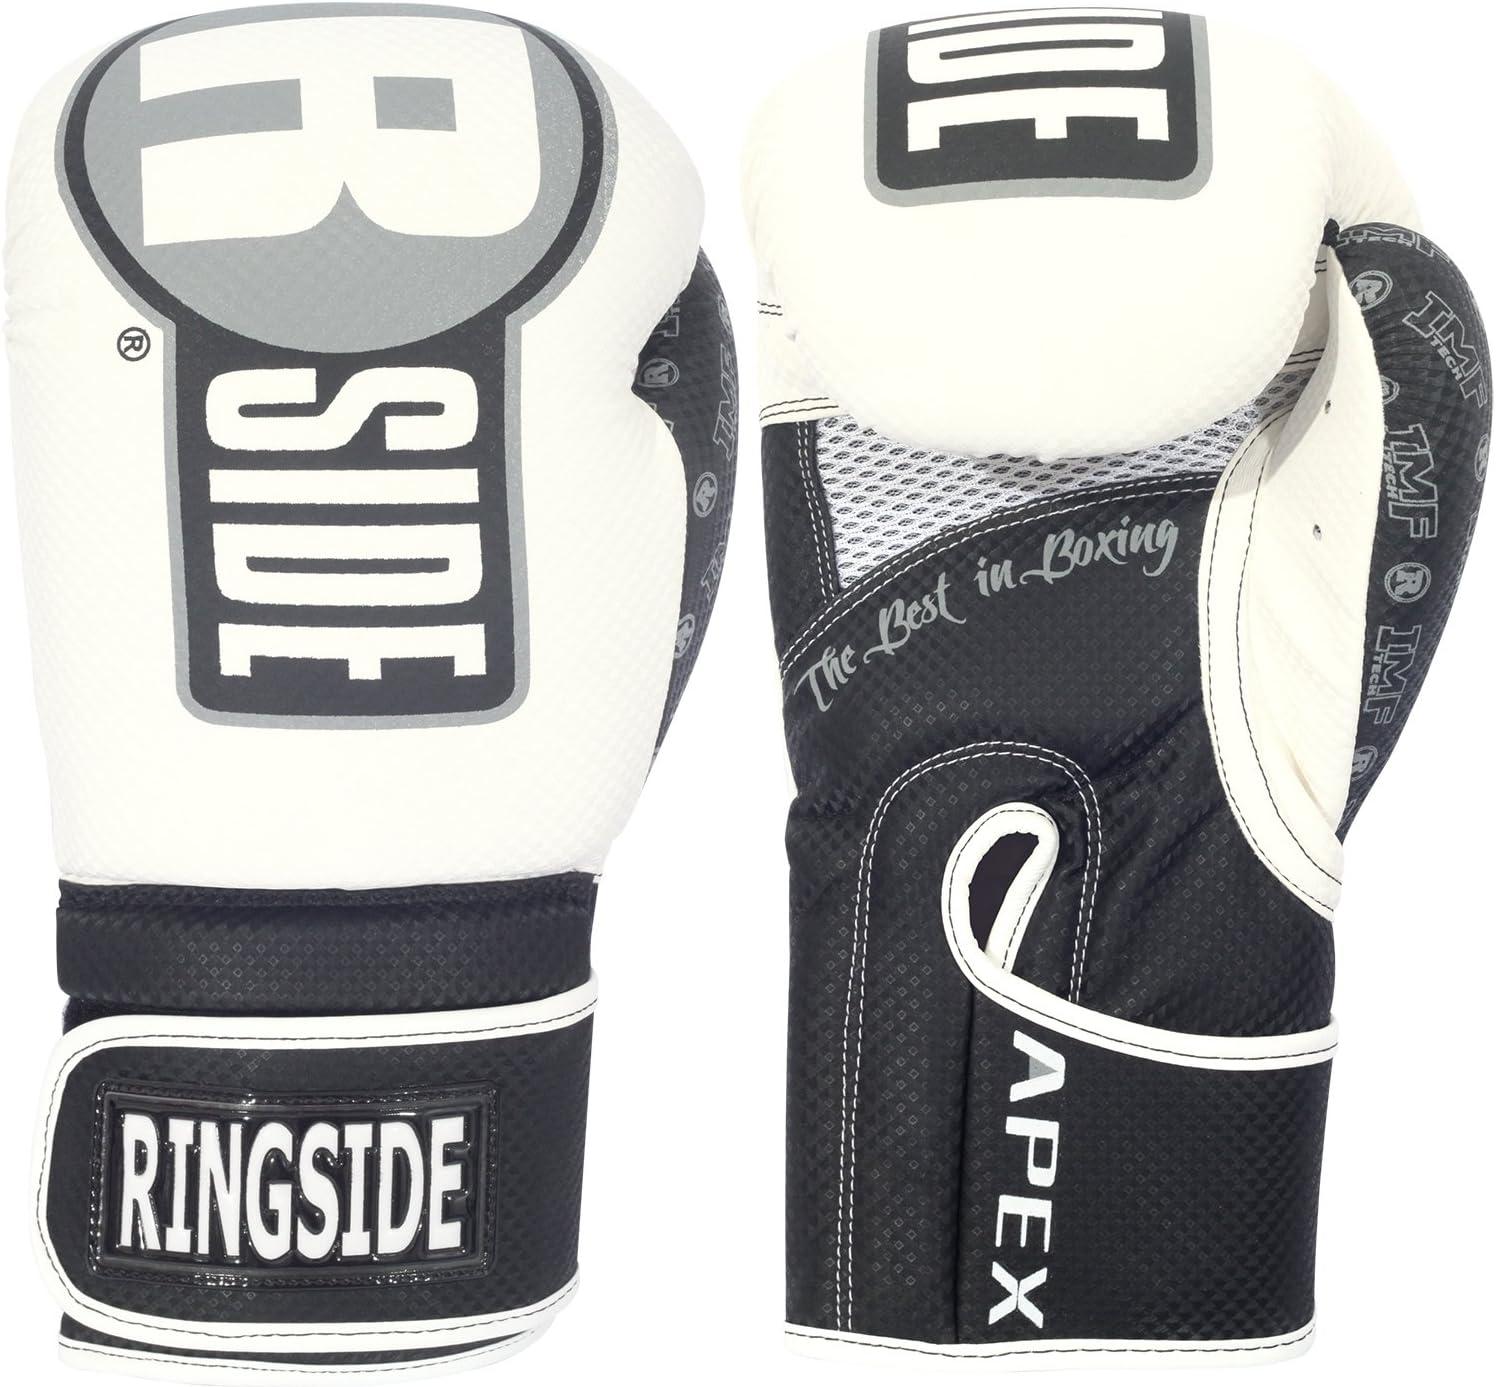 Ringside Apex Boxing Kickboxing Muay Thai Training Gloves Gel Sparring Punching Bag Mitts